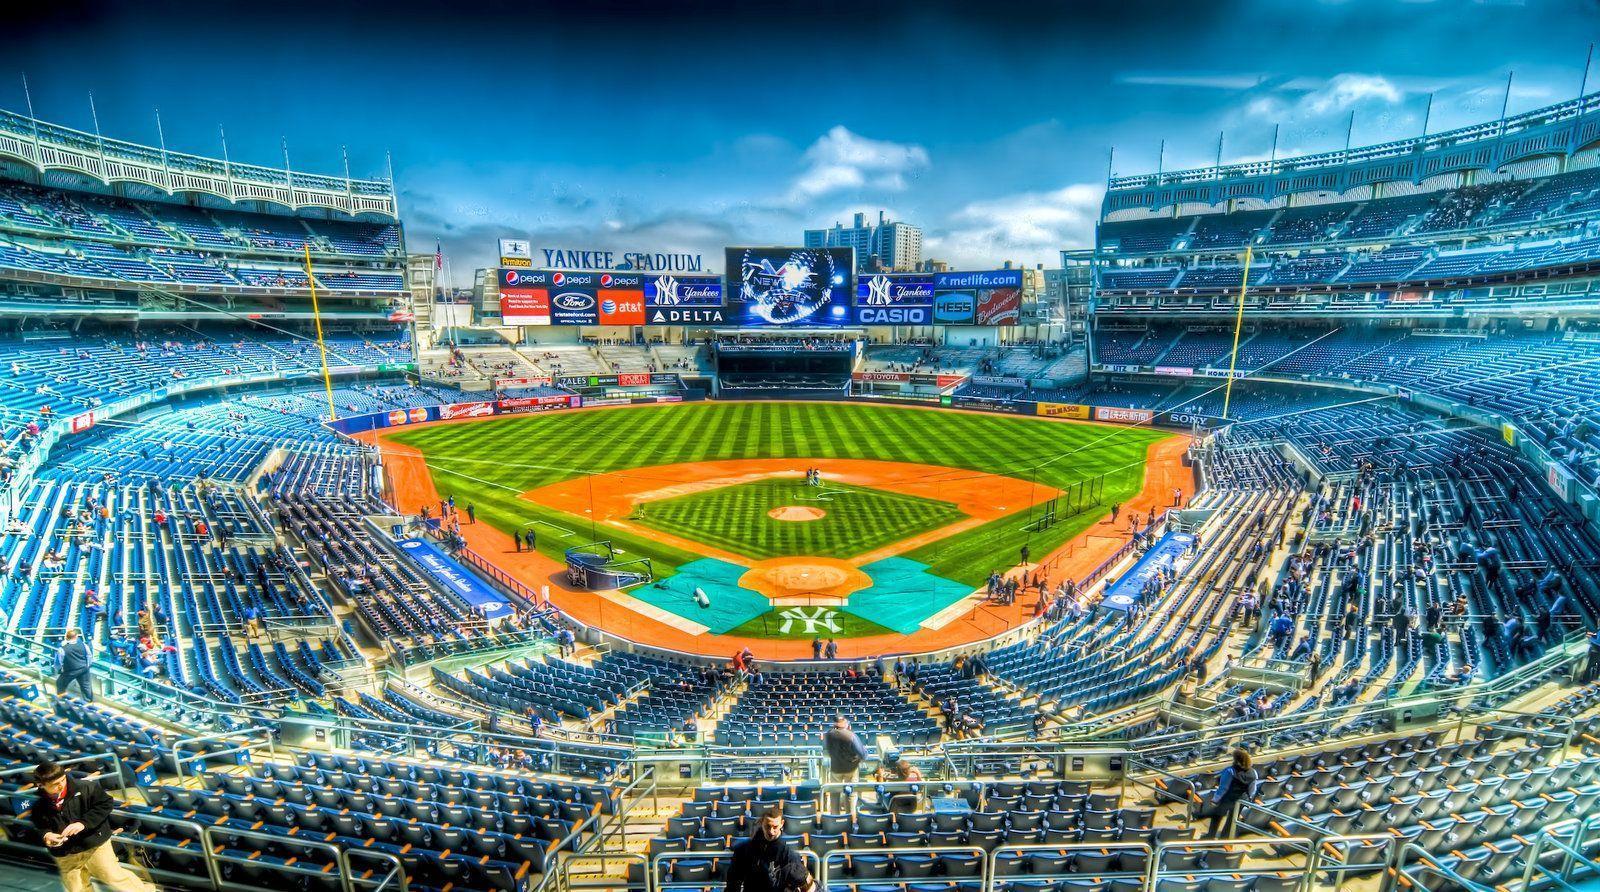 Yankeestadium in addition Yankee Stadium Seating Chart likewise Bench Grinder Attachments furthermore Angel Stadium Of Anaheim Guide also Nationals Park Seating Diagram. on yankee stadium seating chart view